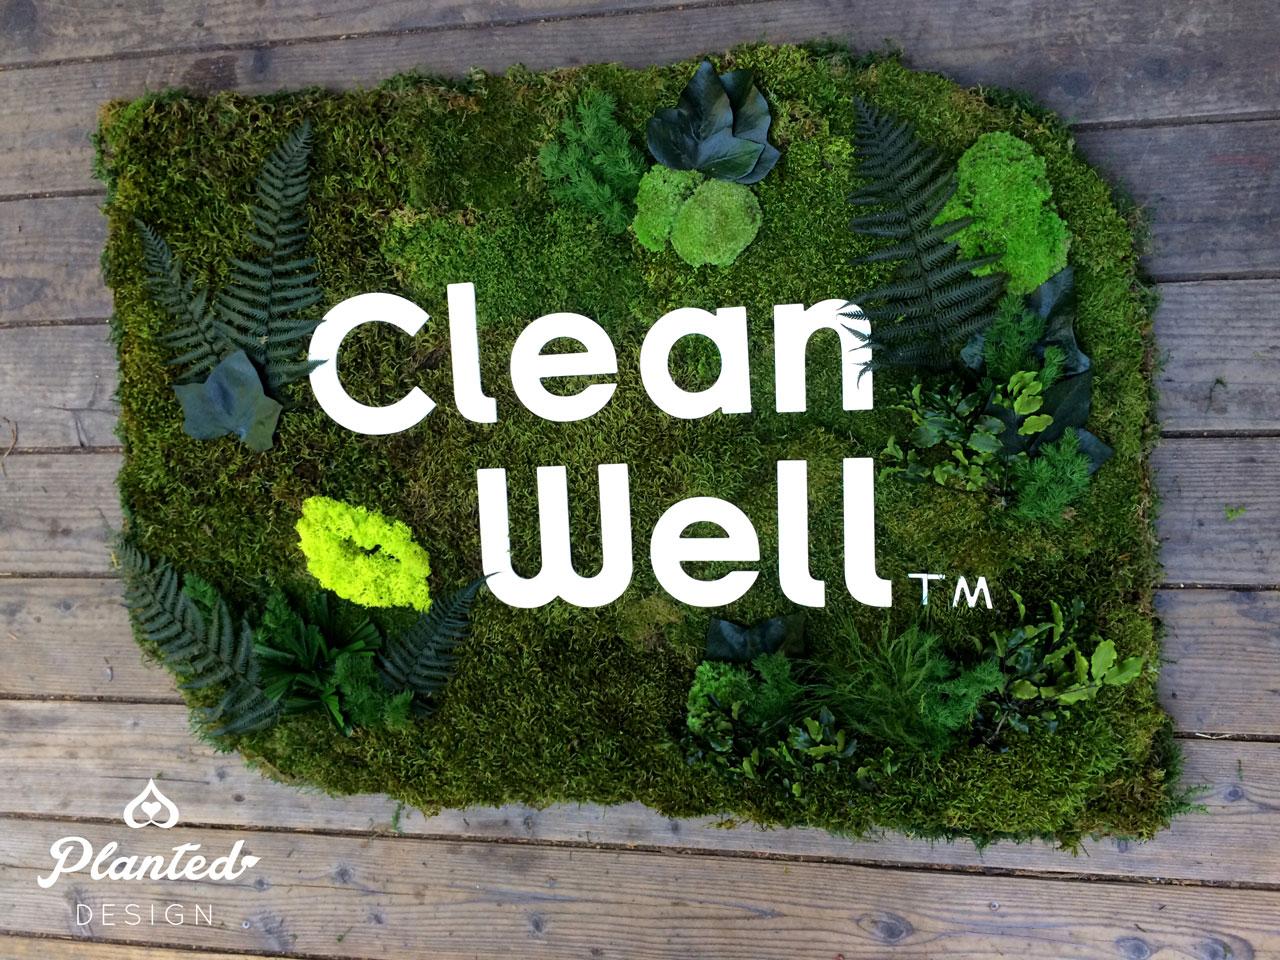 PlantedDesign-Moss-Wall-SF-CleanWell5.jpg